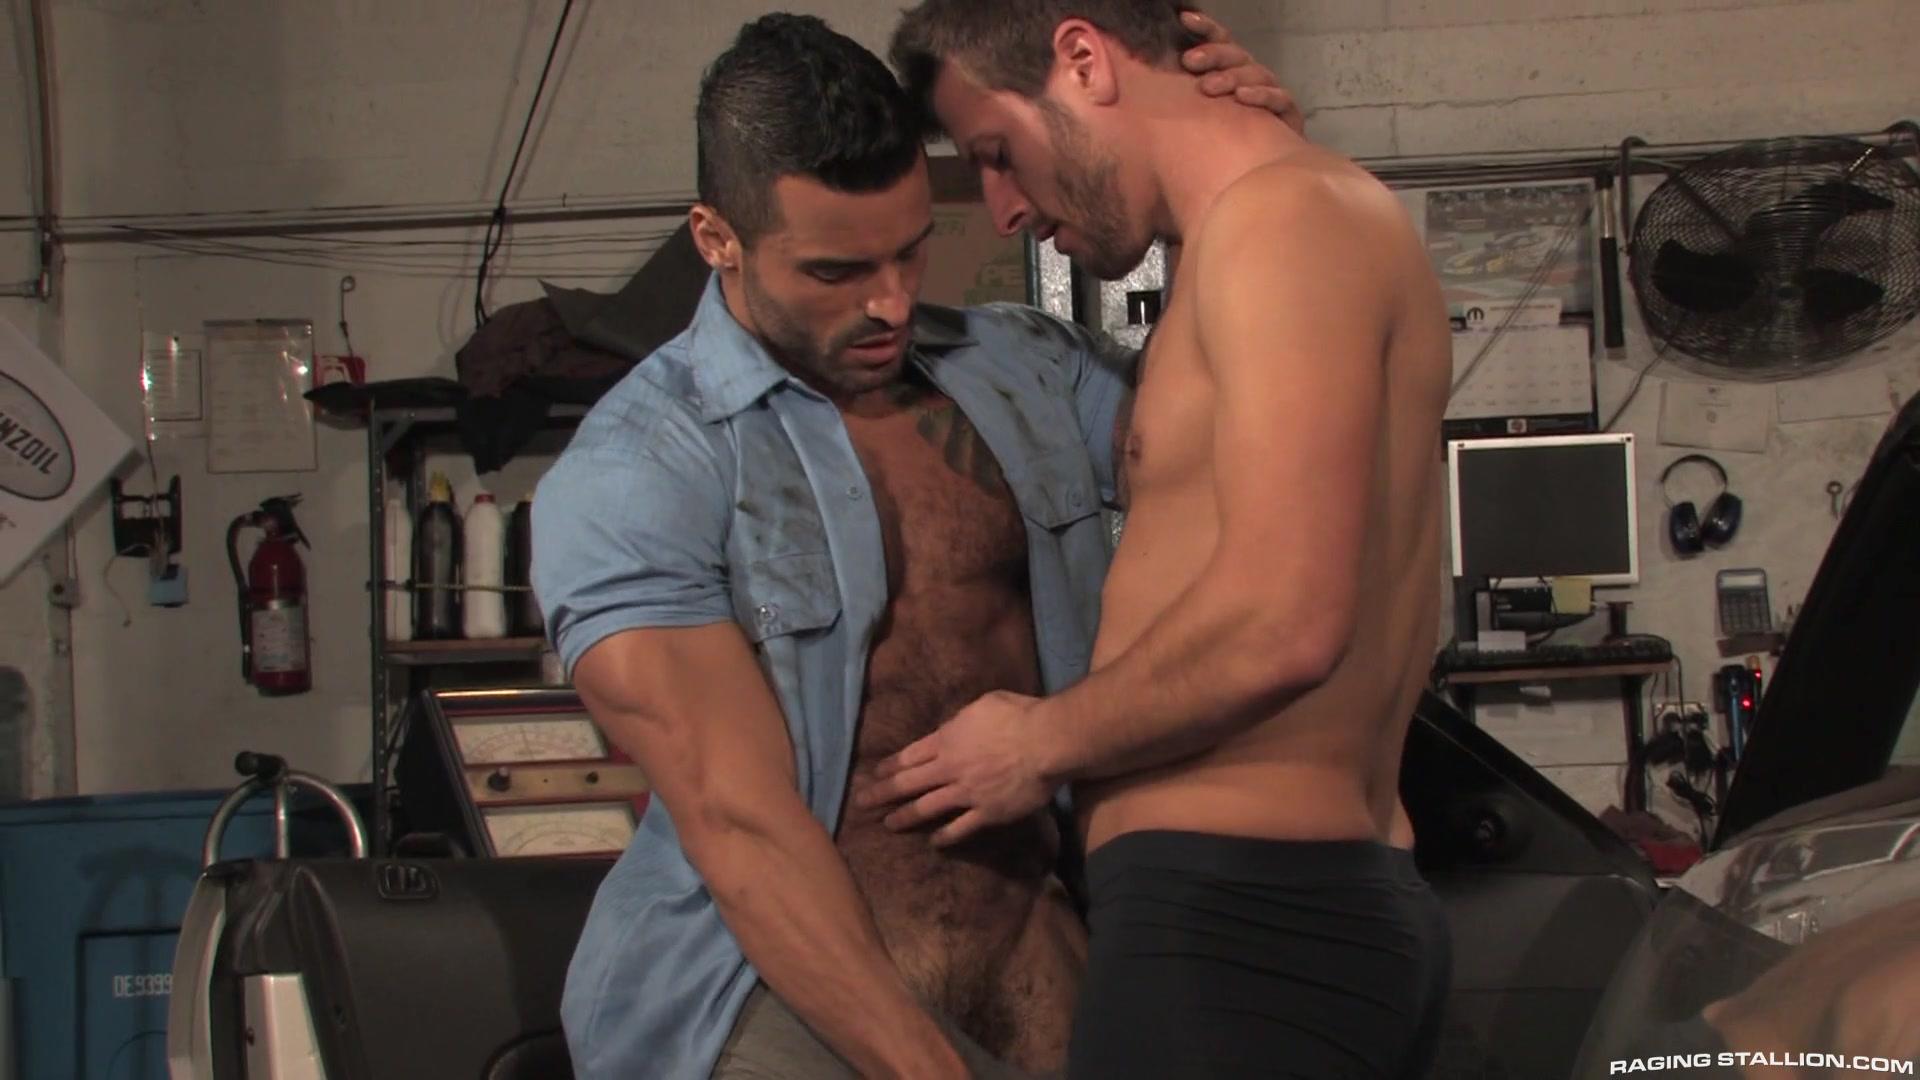 Alexsander Freitas Porn Hd diamond auto - scene 1 gay porno hd online